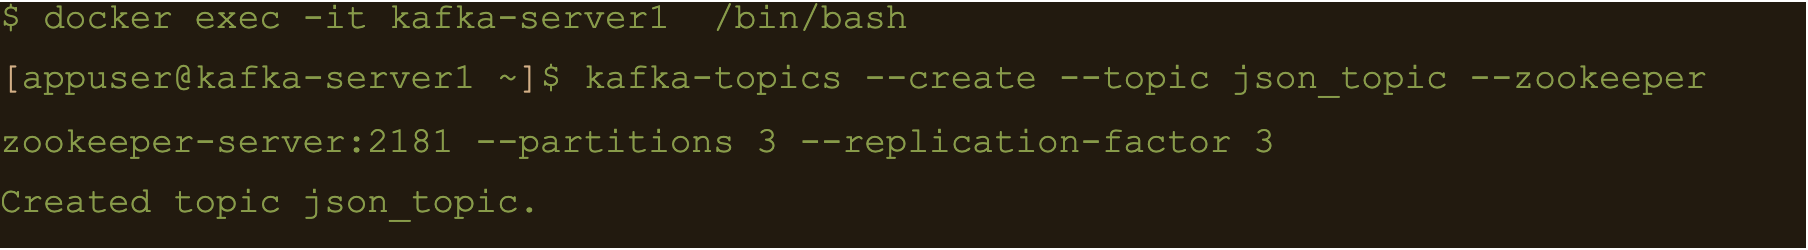 create --topic json_topic